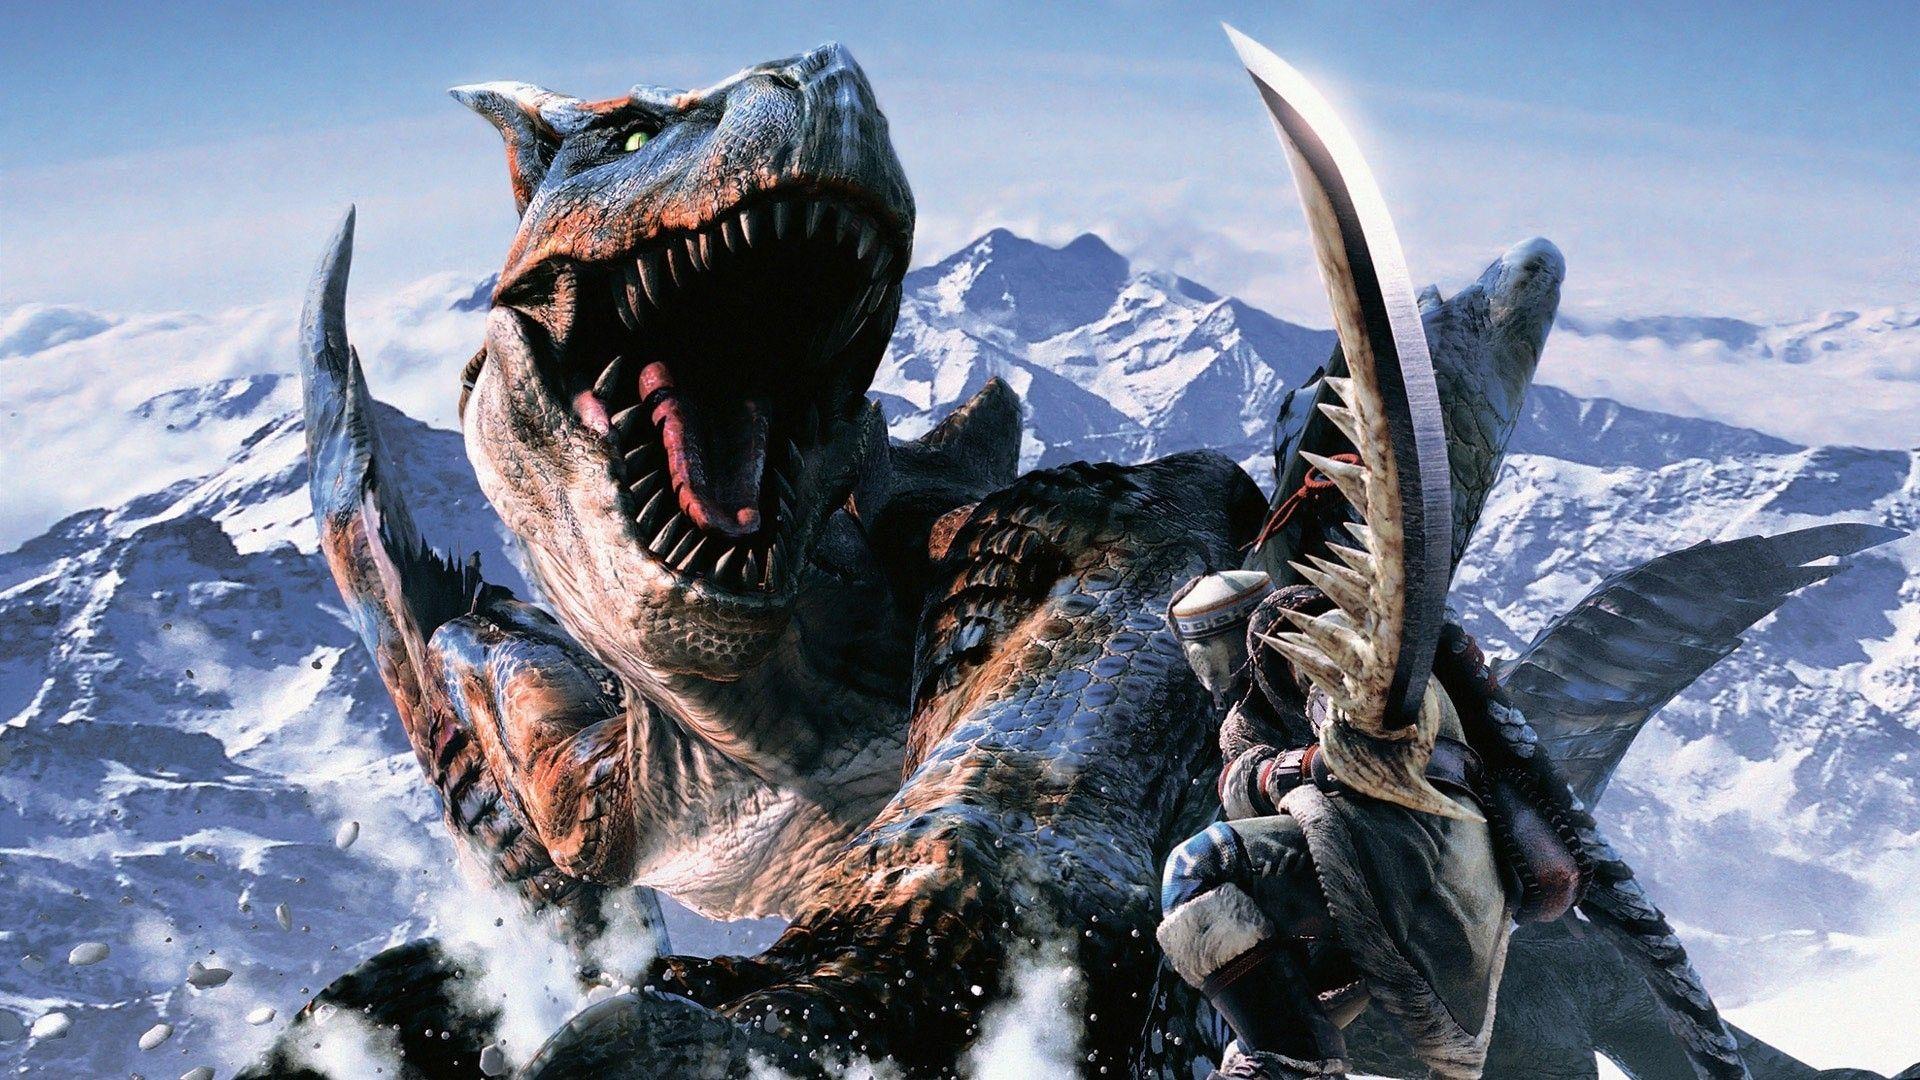 undefined Monster Hunter Backgrounds (36 Wallpapers